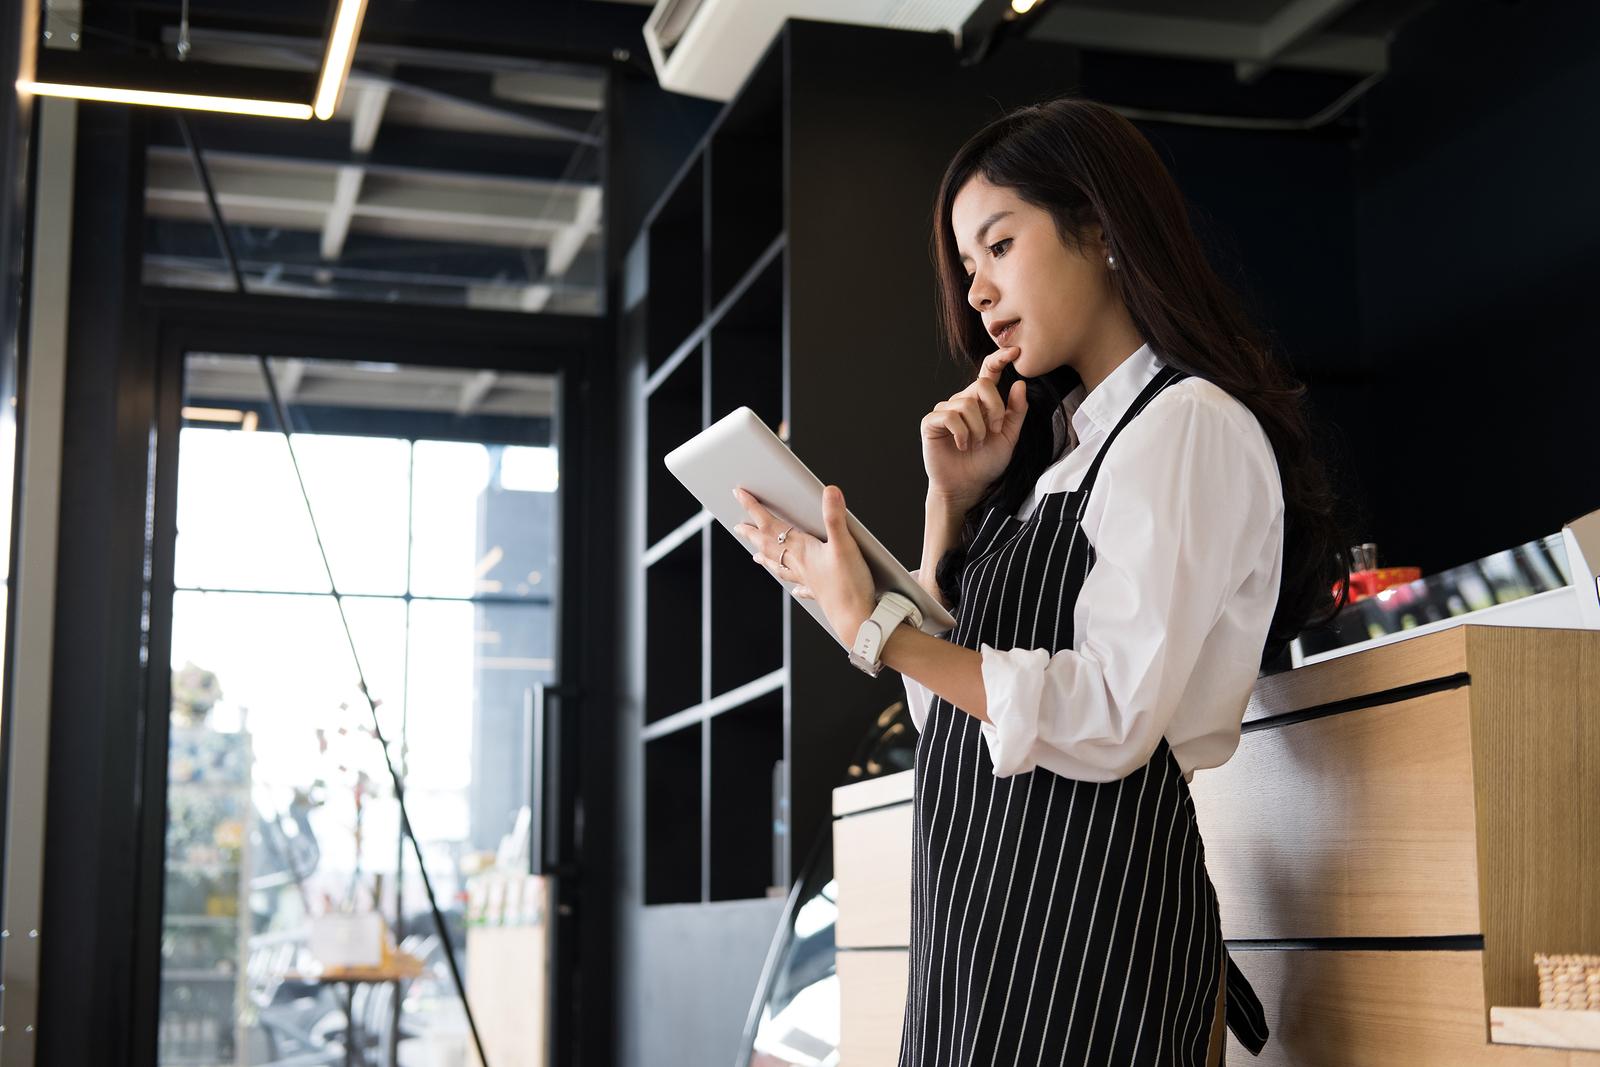 restaurant employee training in tablet